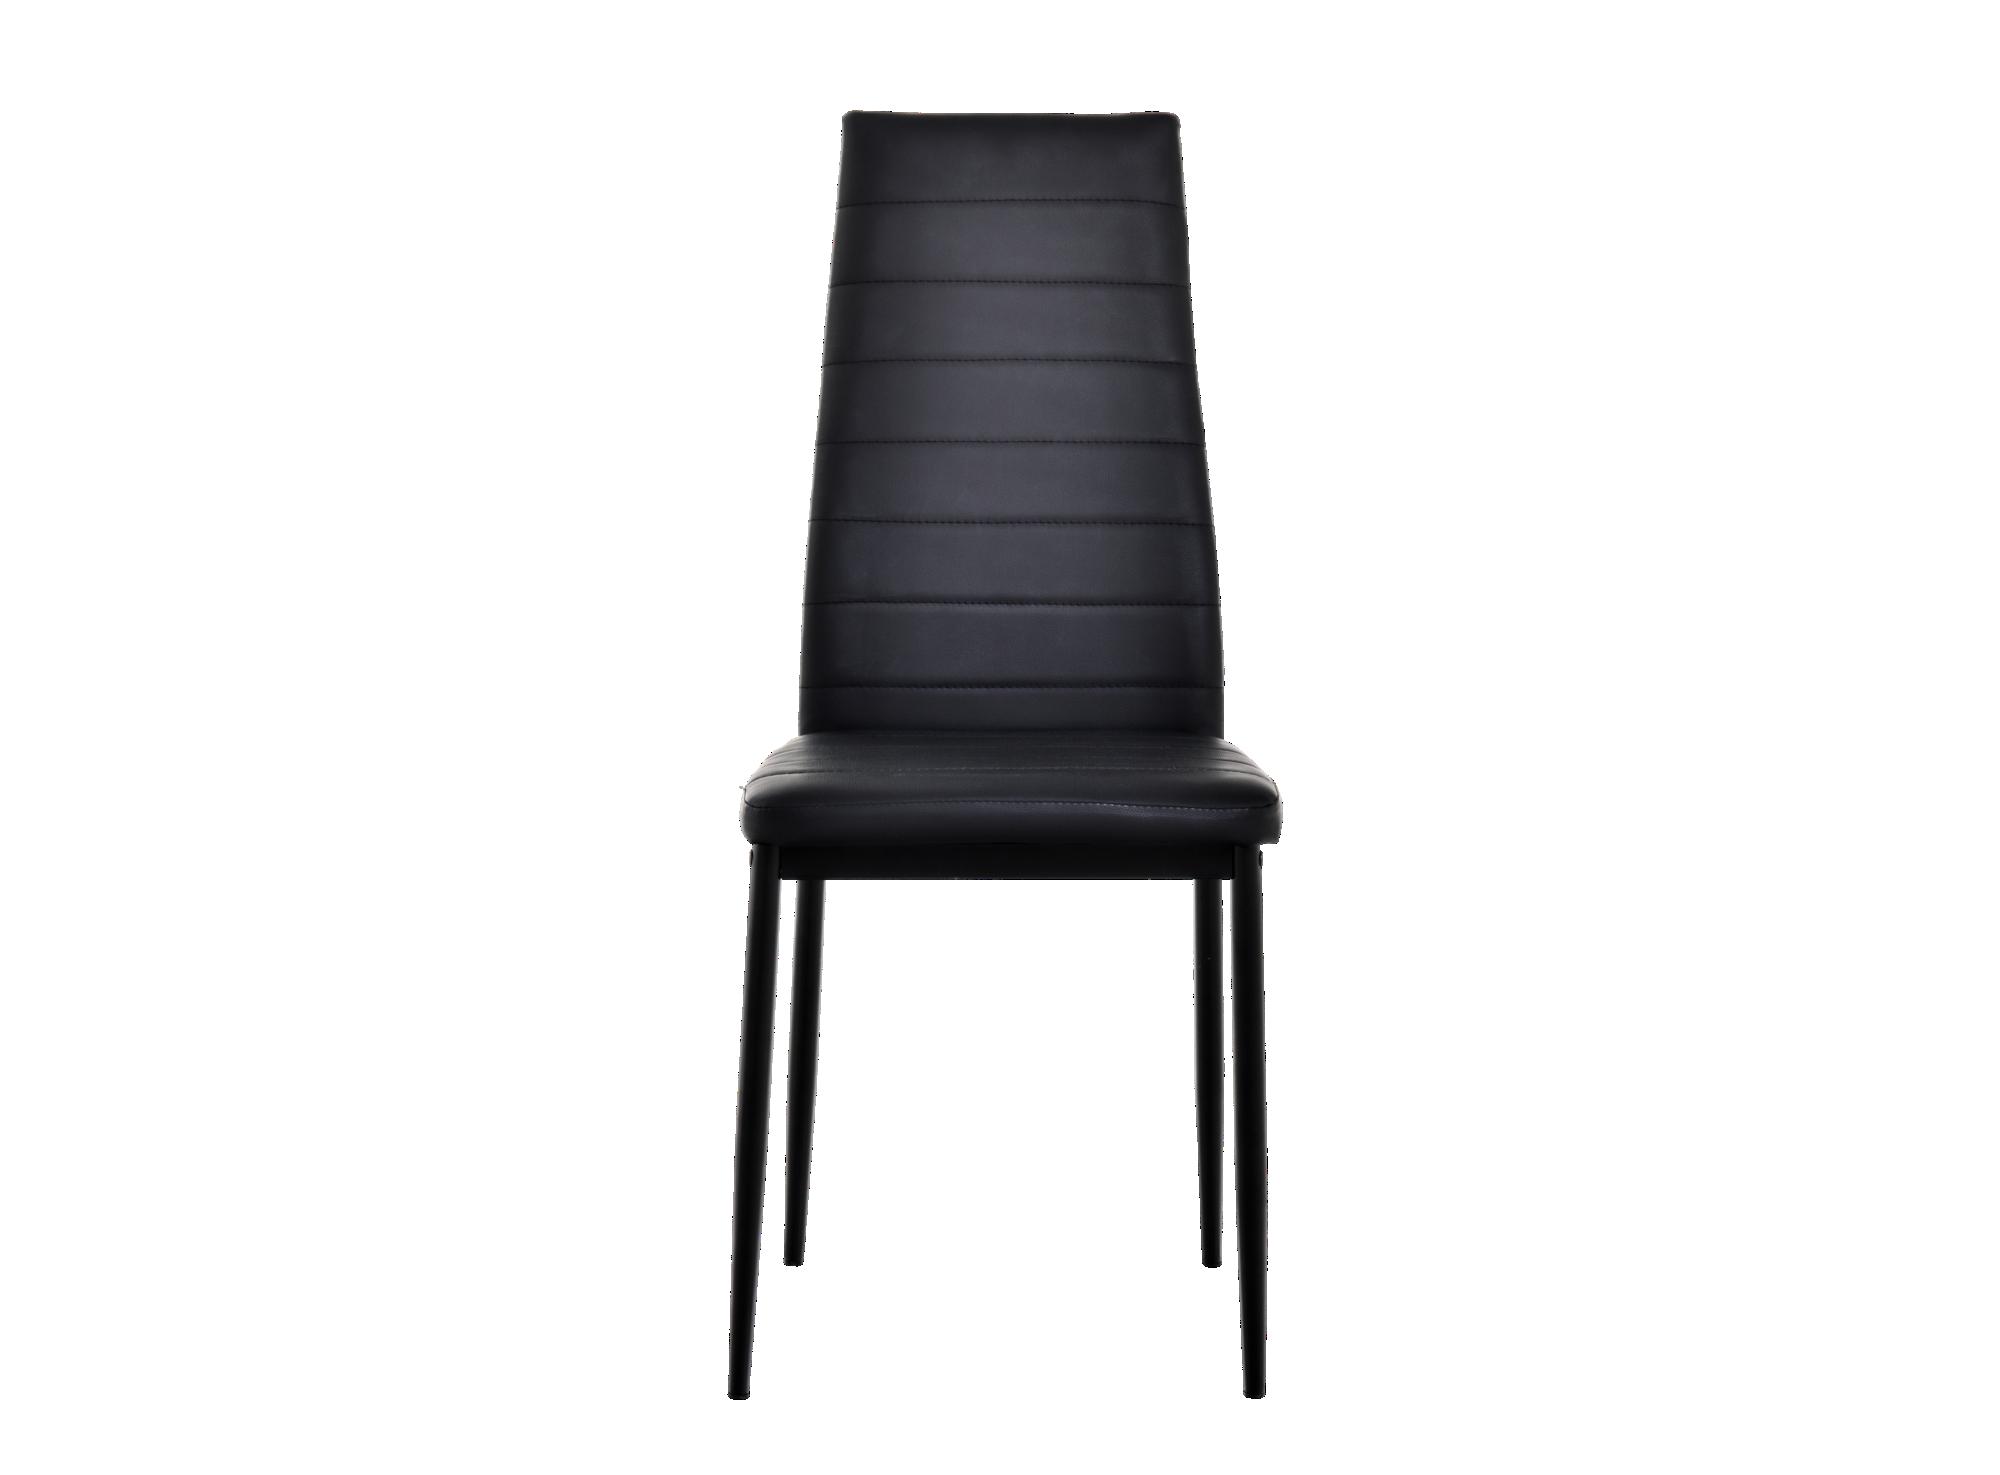 Chaise pu noir chaise table chaise meuble fly for Chaise noir fly